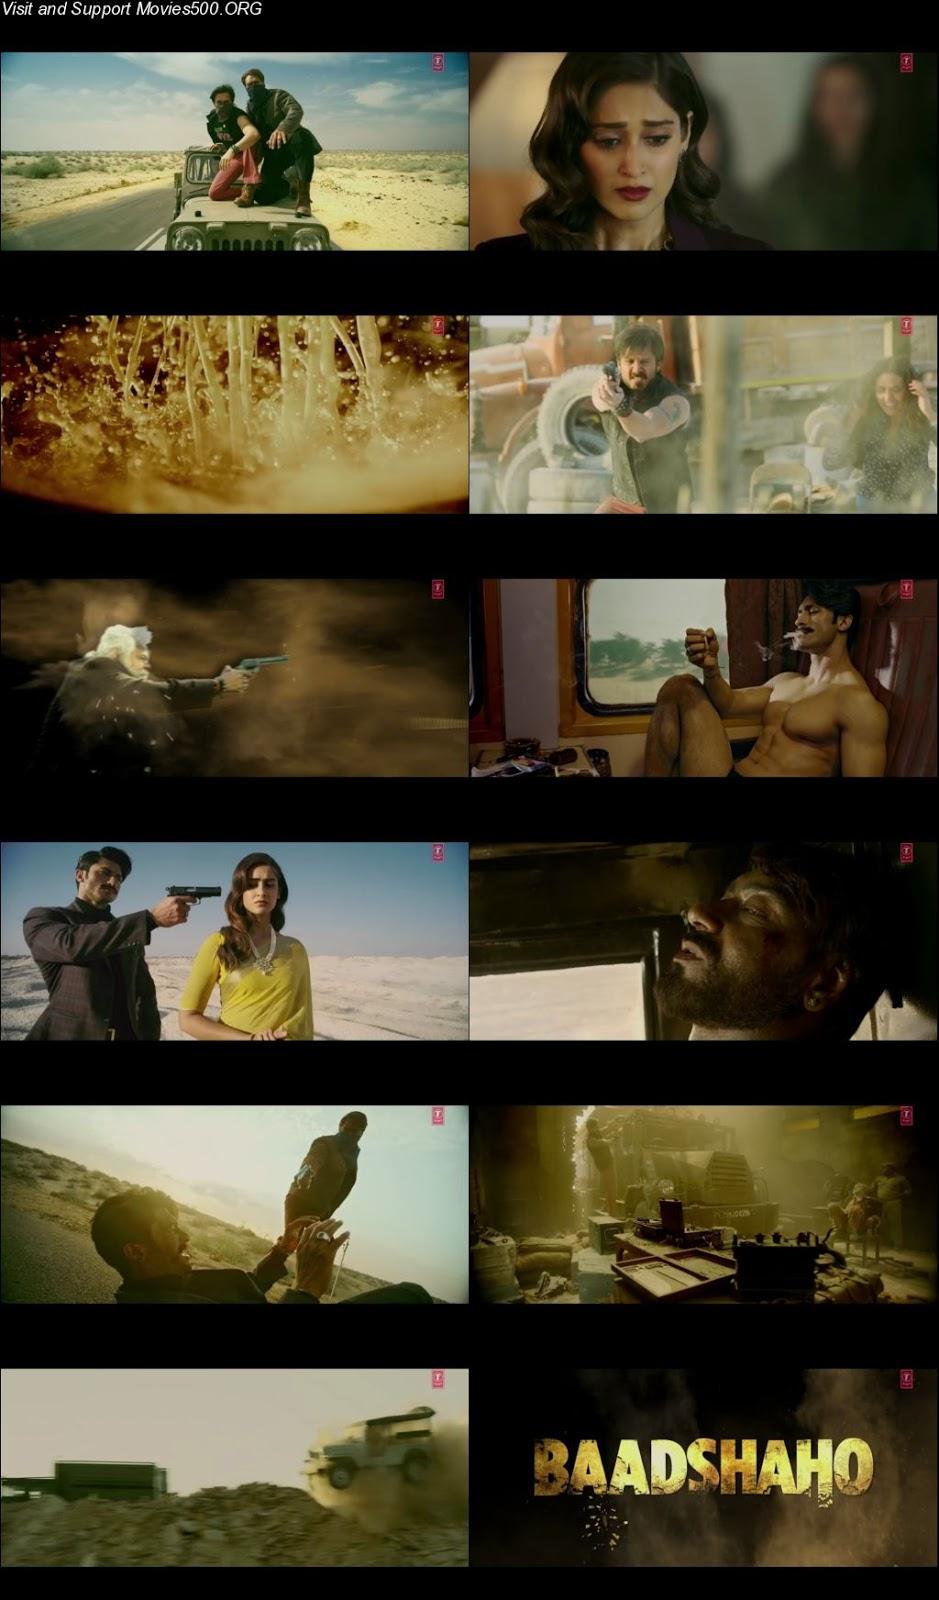 Baadshaho 2017 Hindi Movie Official Trailer Download HD 720P at movies500.me